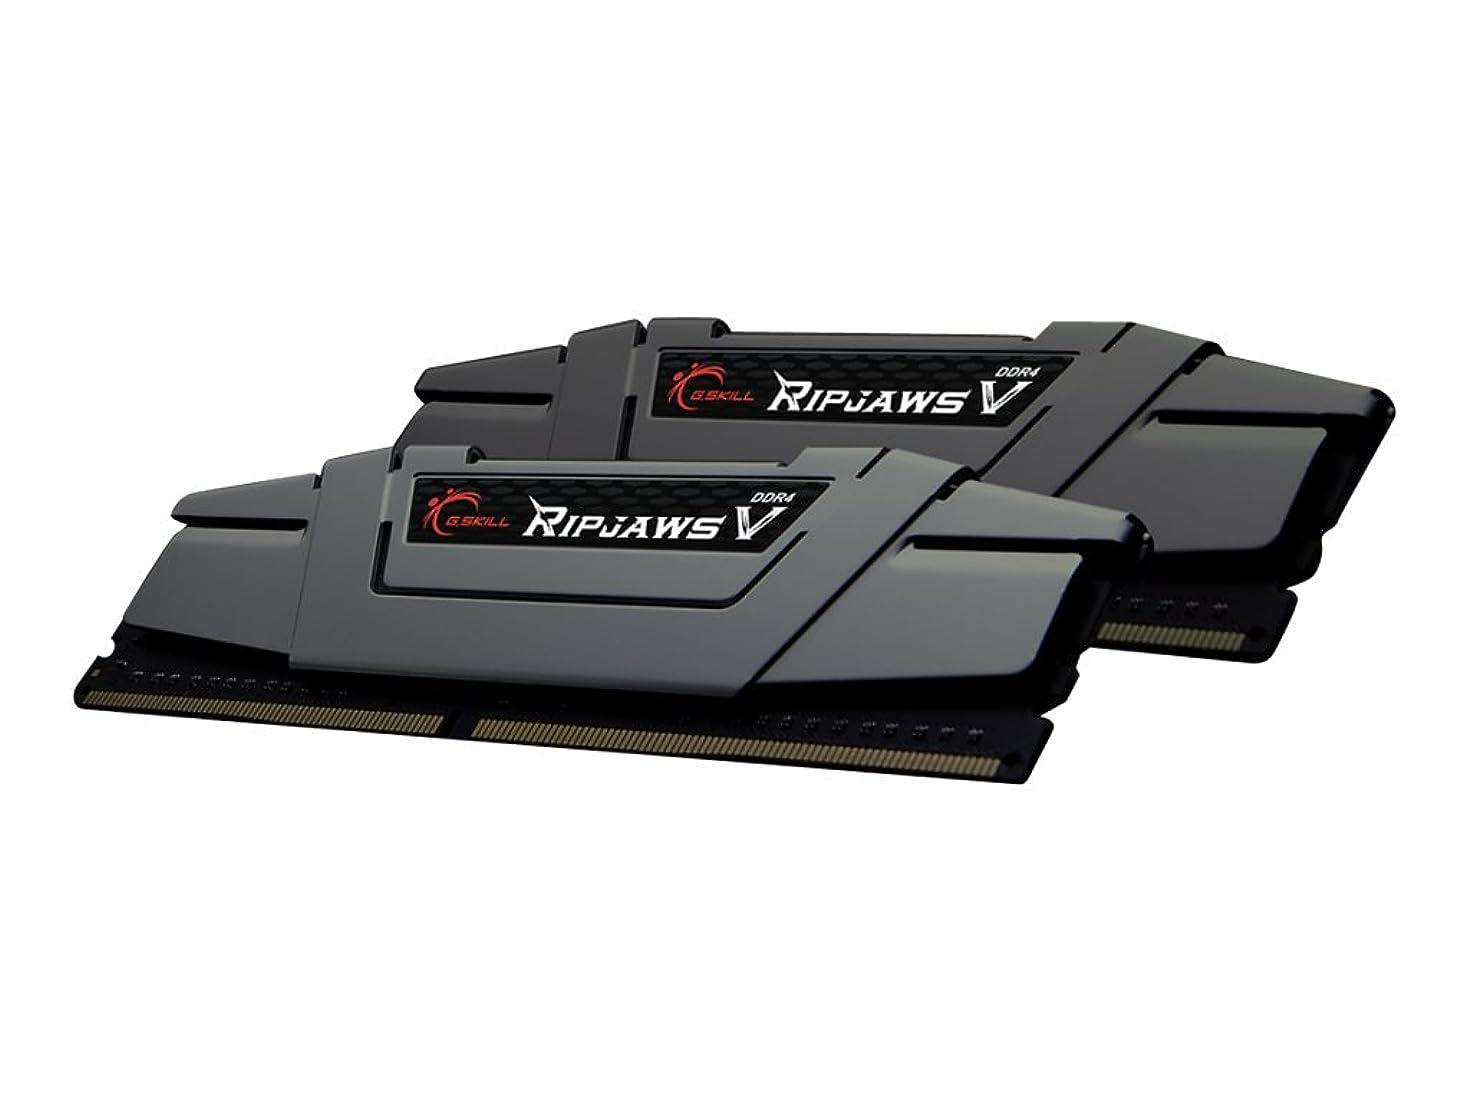 G.Skill Ripjaws V Series 16GB (2 x 8GB) 288-Pin SDRAM DDR4 3200 (PC4 25600) Intel Z170 Desktop Memory F4-3200C16D-16GVGB